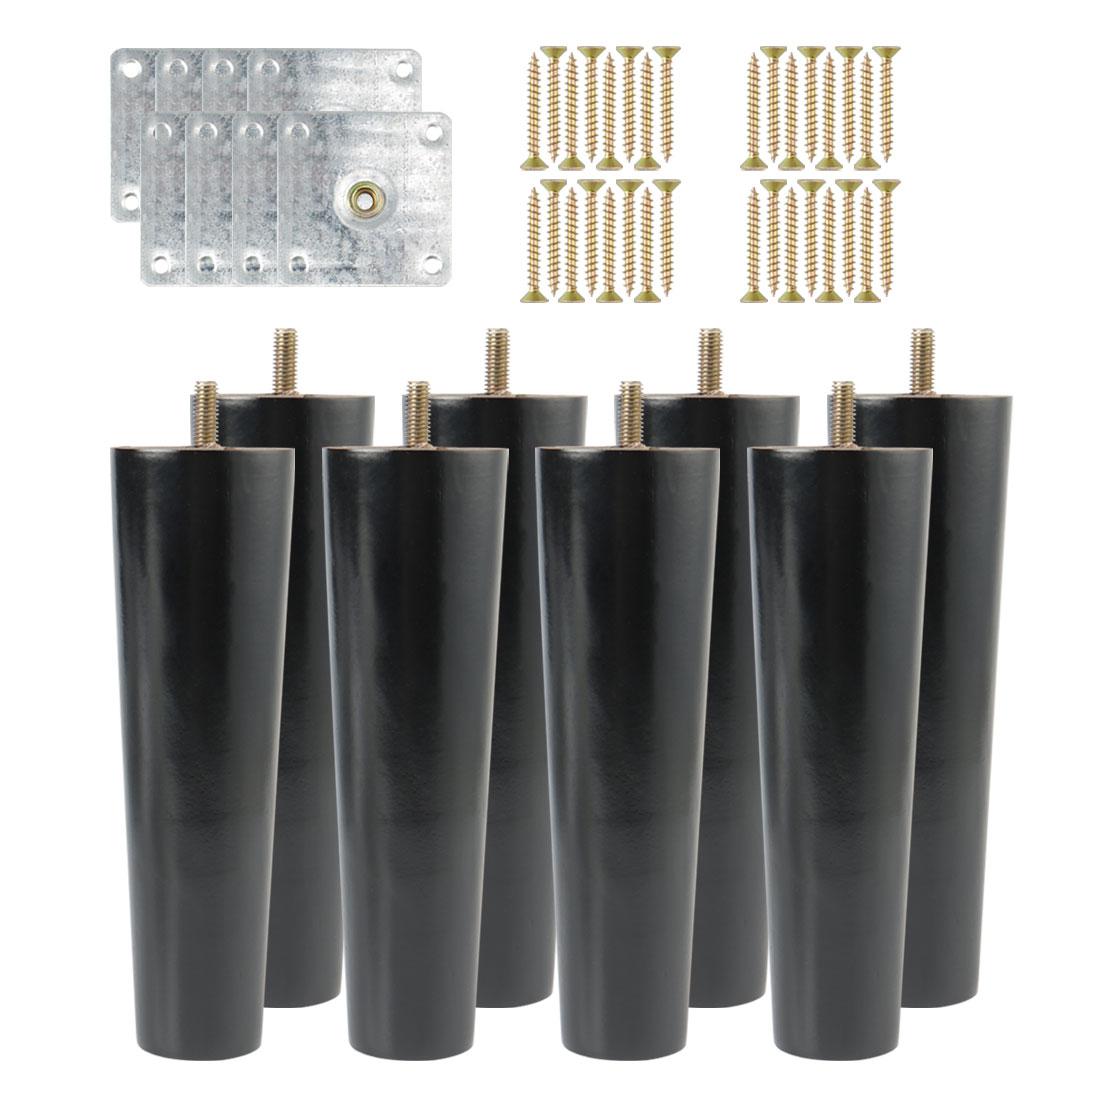 "7"" Solid Wood Furniture Leg Table Feet Hoist Adjuster Replacement Black Set of 8"